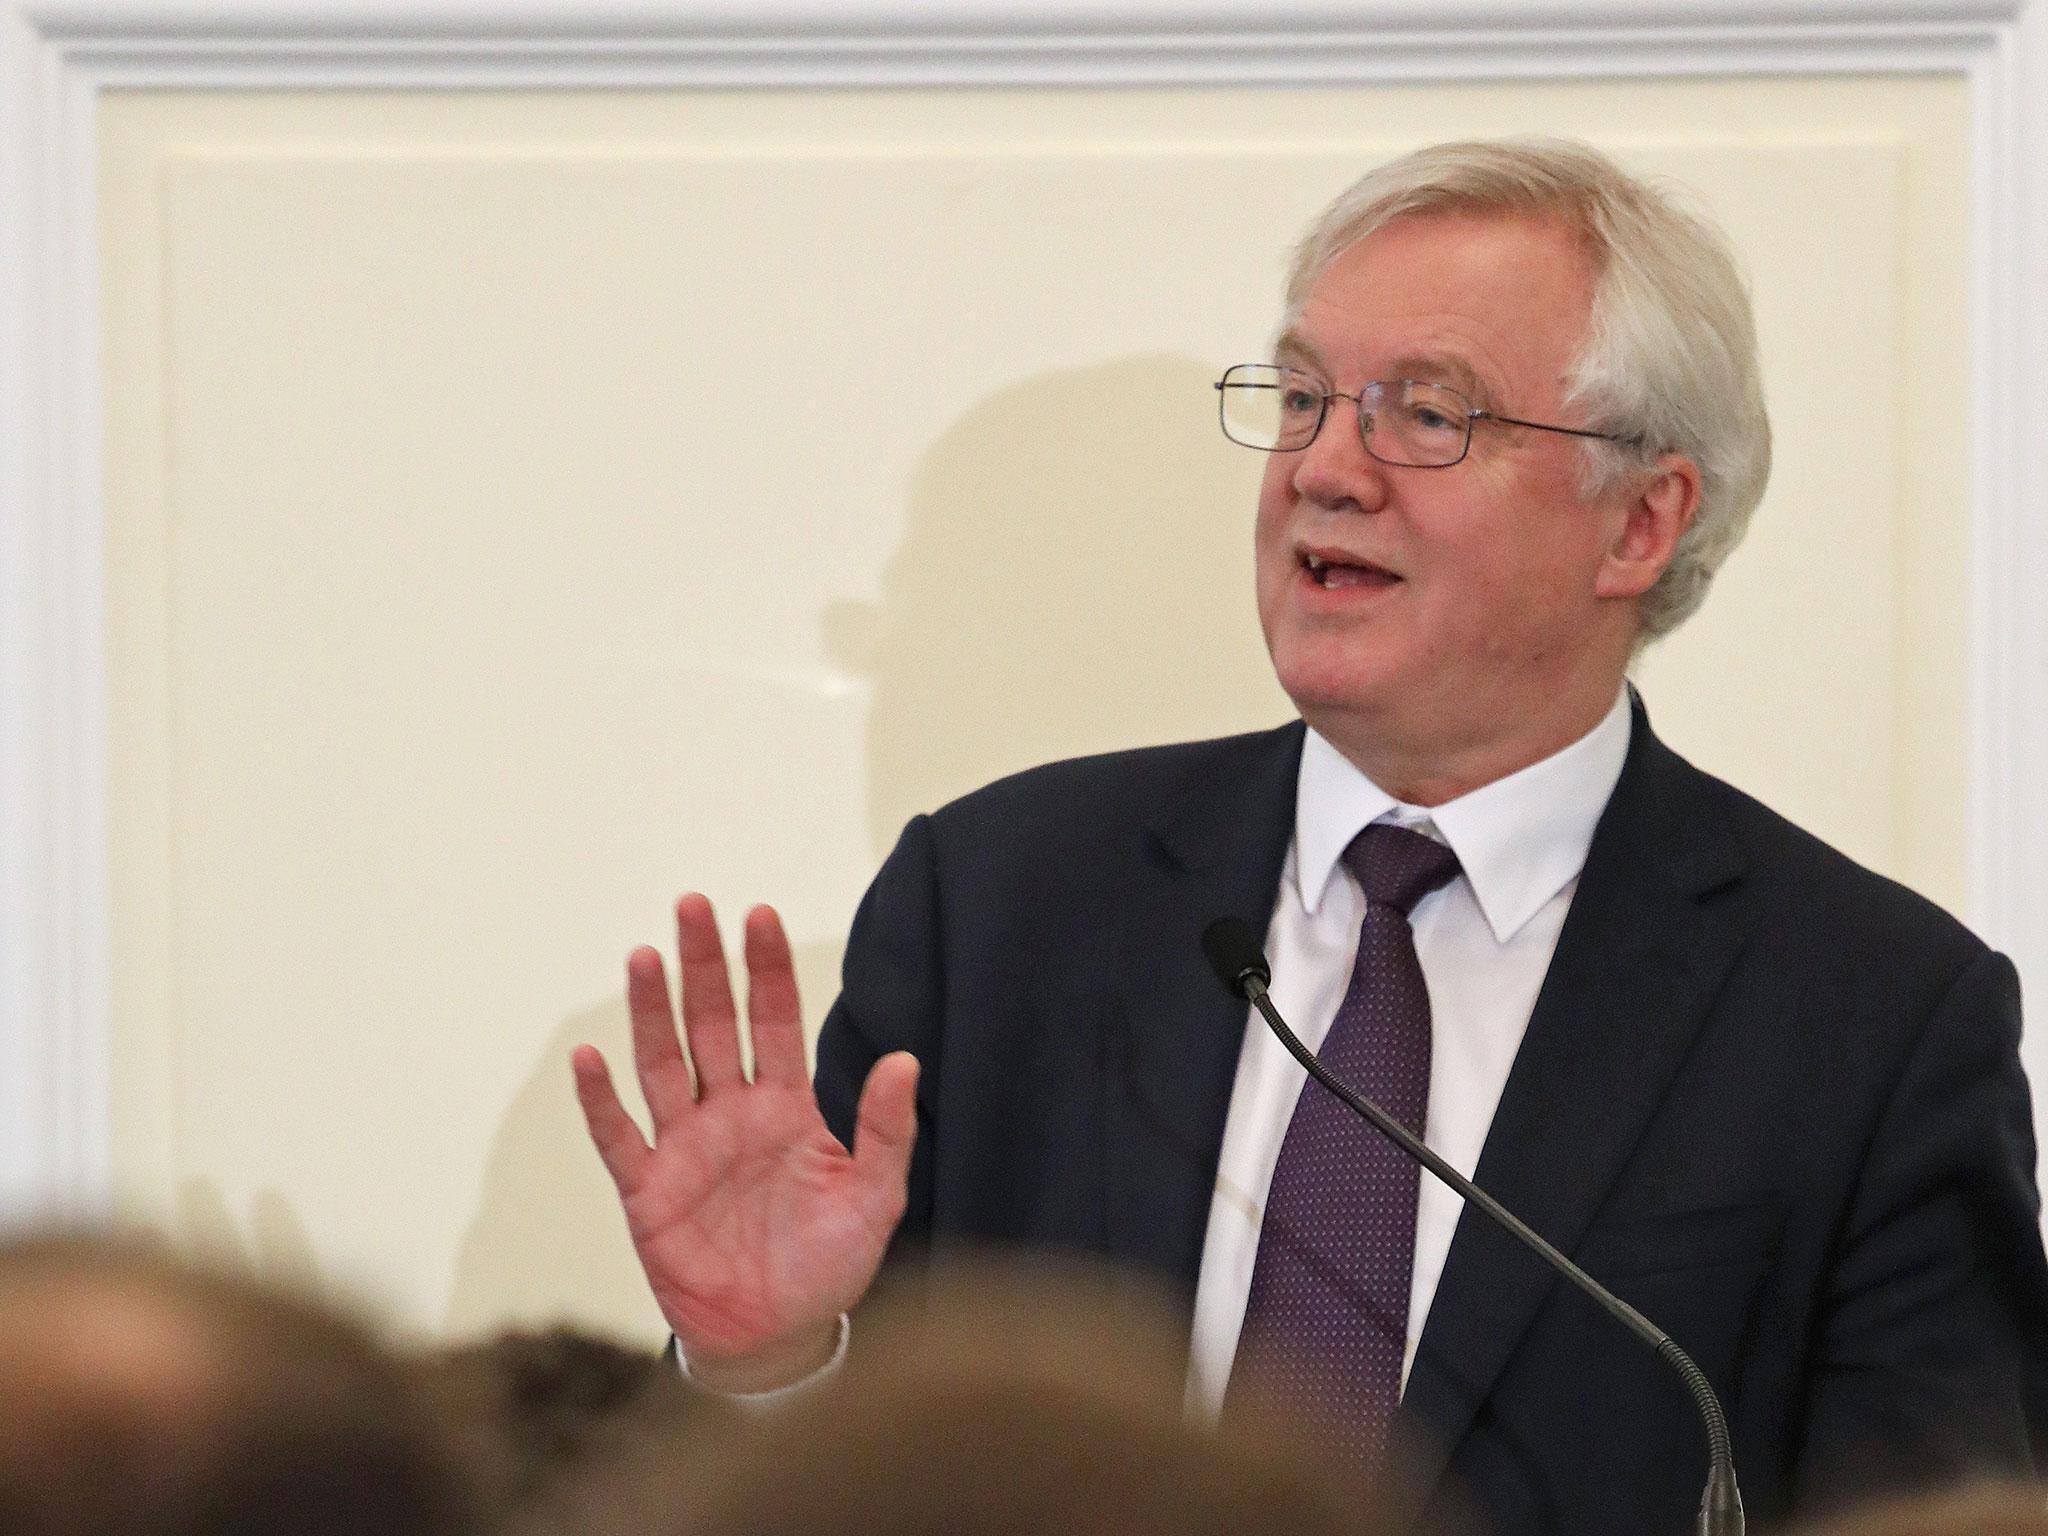 David Davis rushes to repair damage after 'undermining trust' in negotiations